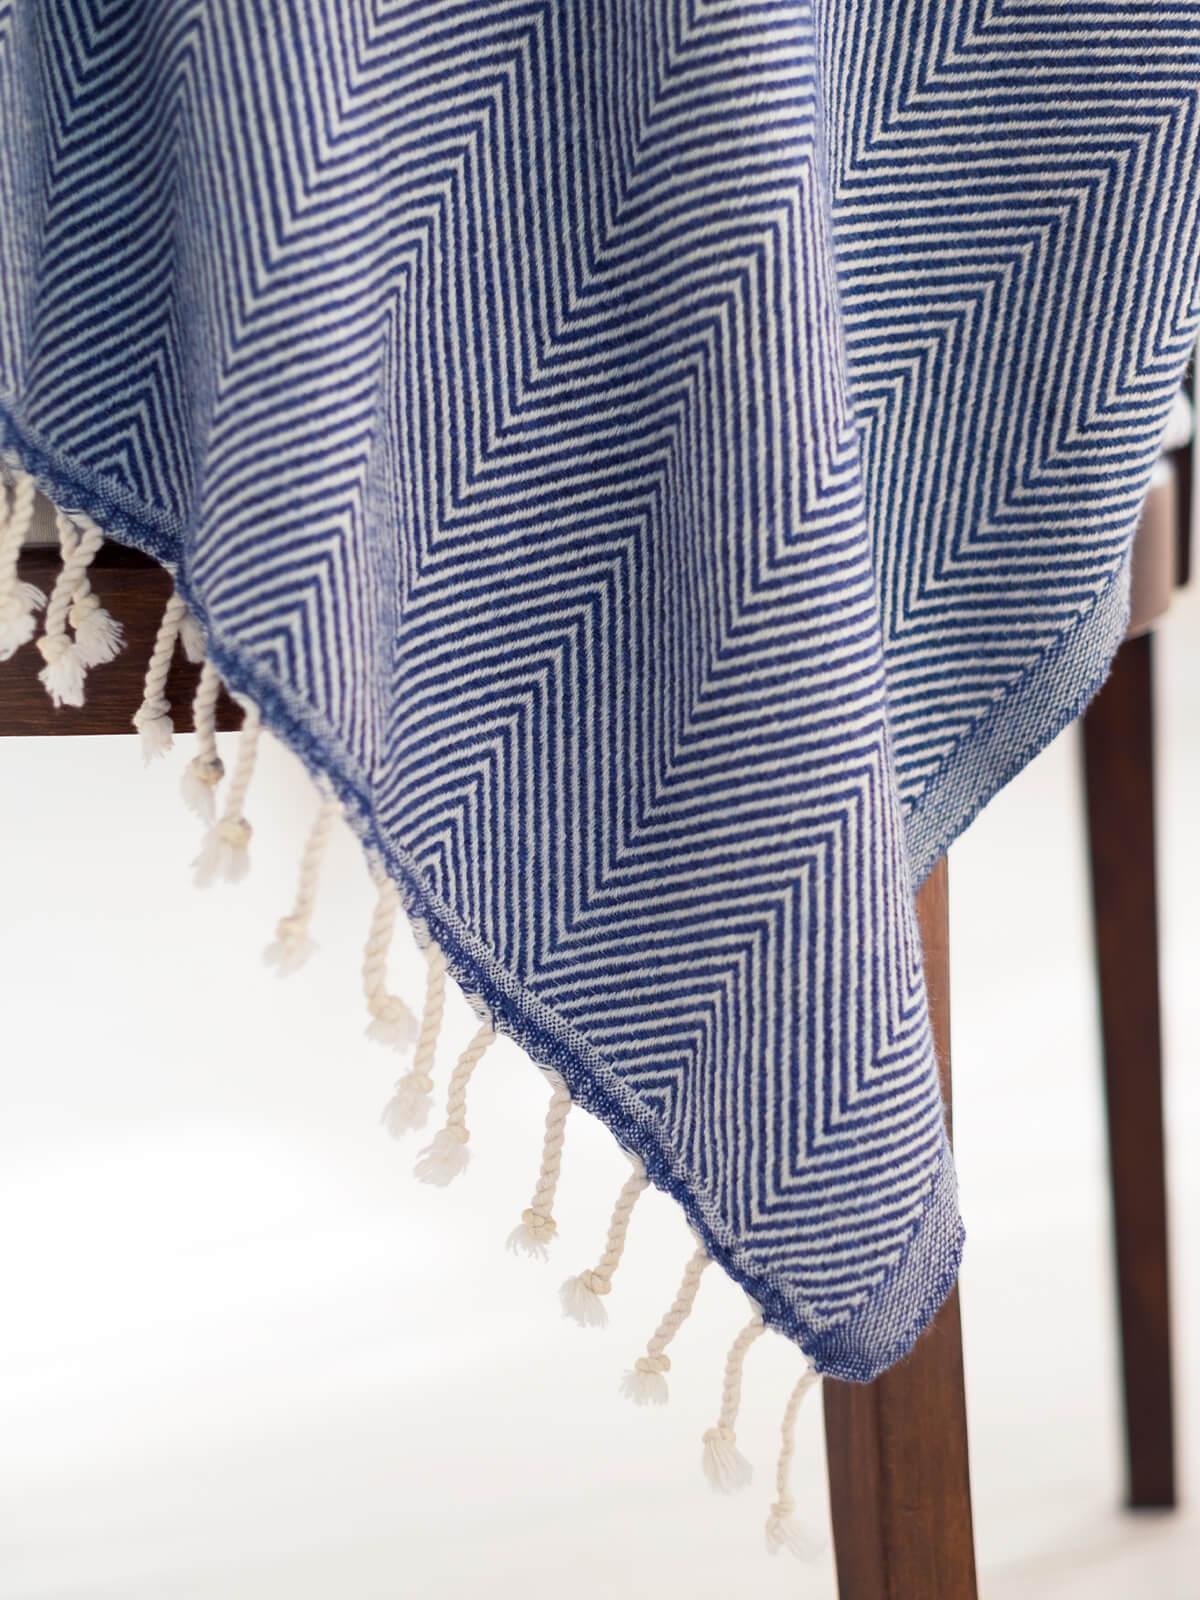 wool-herringbone-koltuk-sali-denim-1200×1600